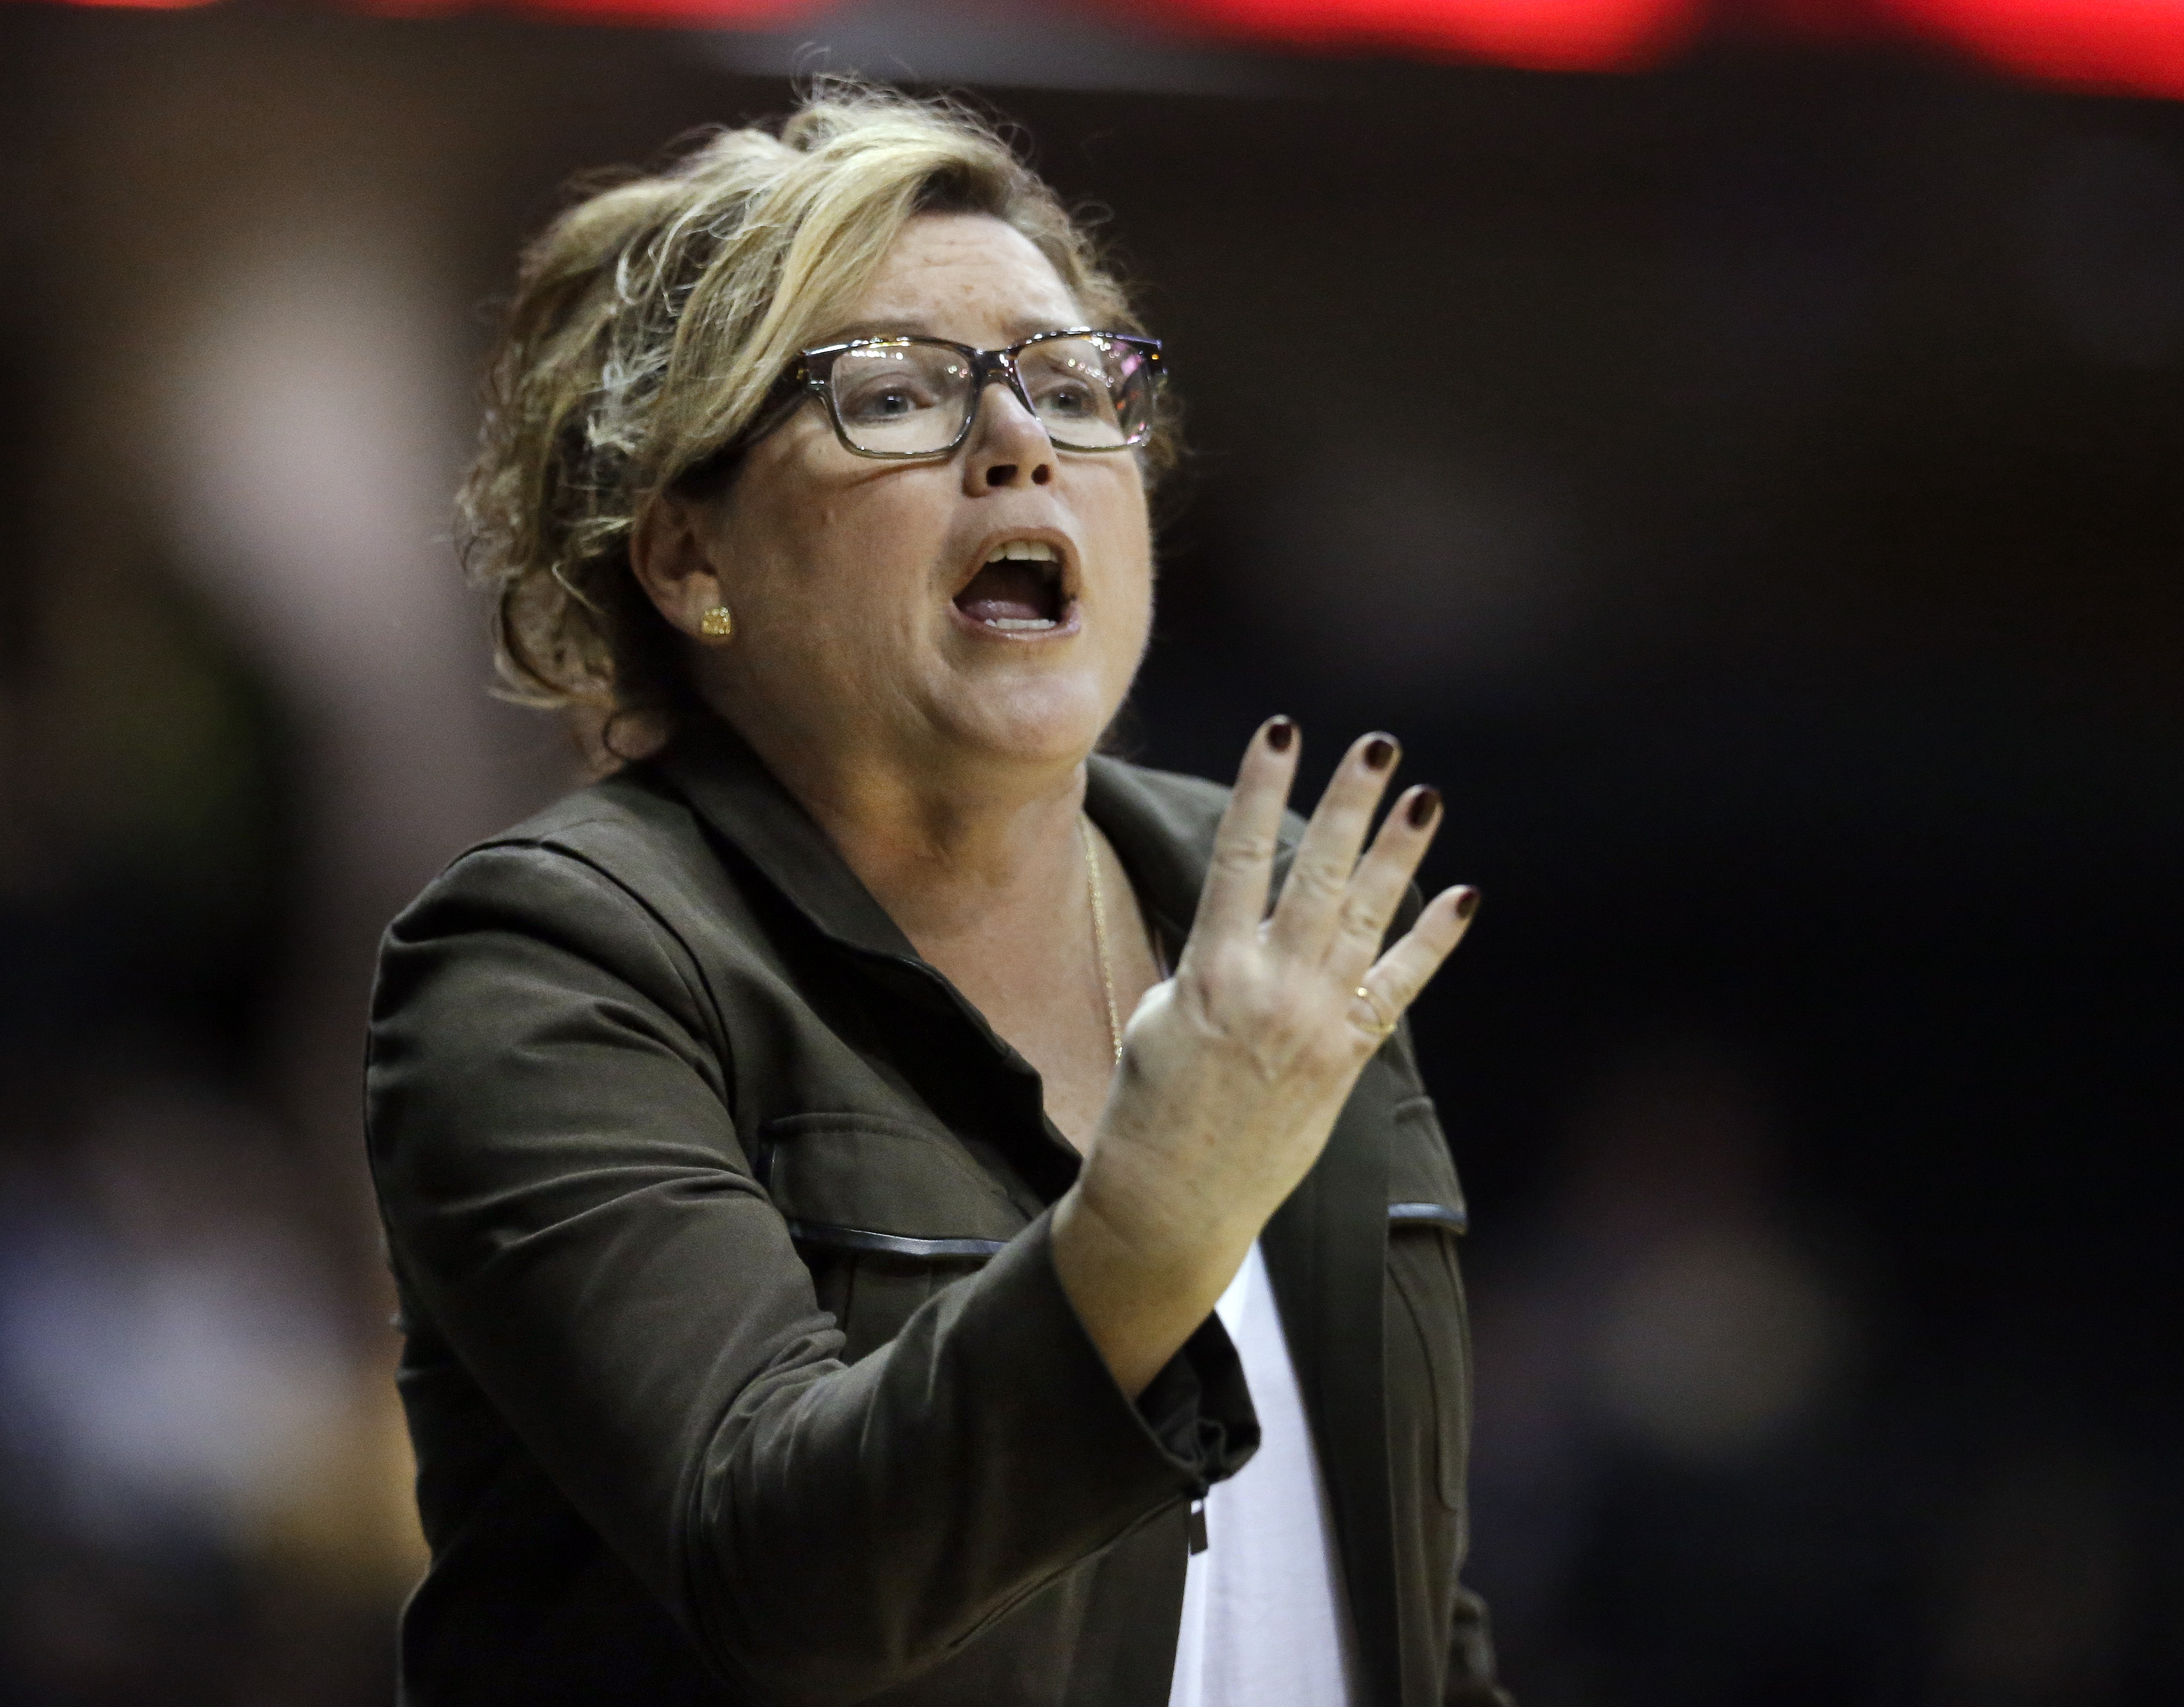 Vanderbilt coach Melanie Balcomb yells to her team during the second half of an NCAA college basketball game against South Carolina on Thursday, Jan. 7, 2016, in Nashville, Tenn. South Carolina won 71-61. (AP Photo/Mark Humphrey)